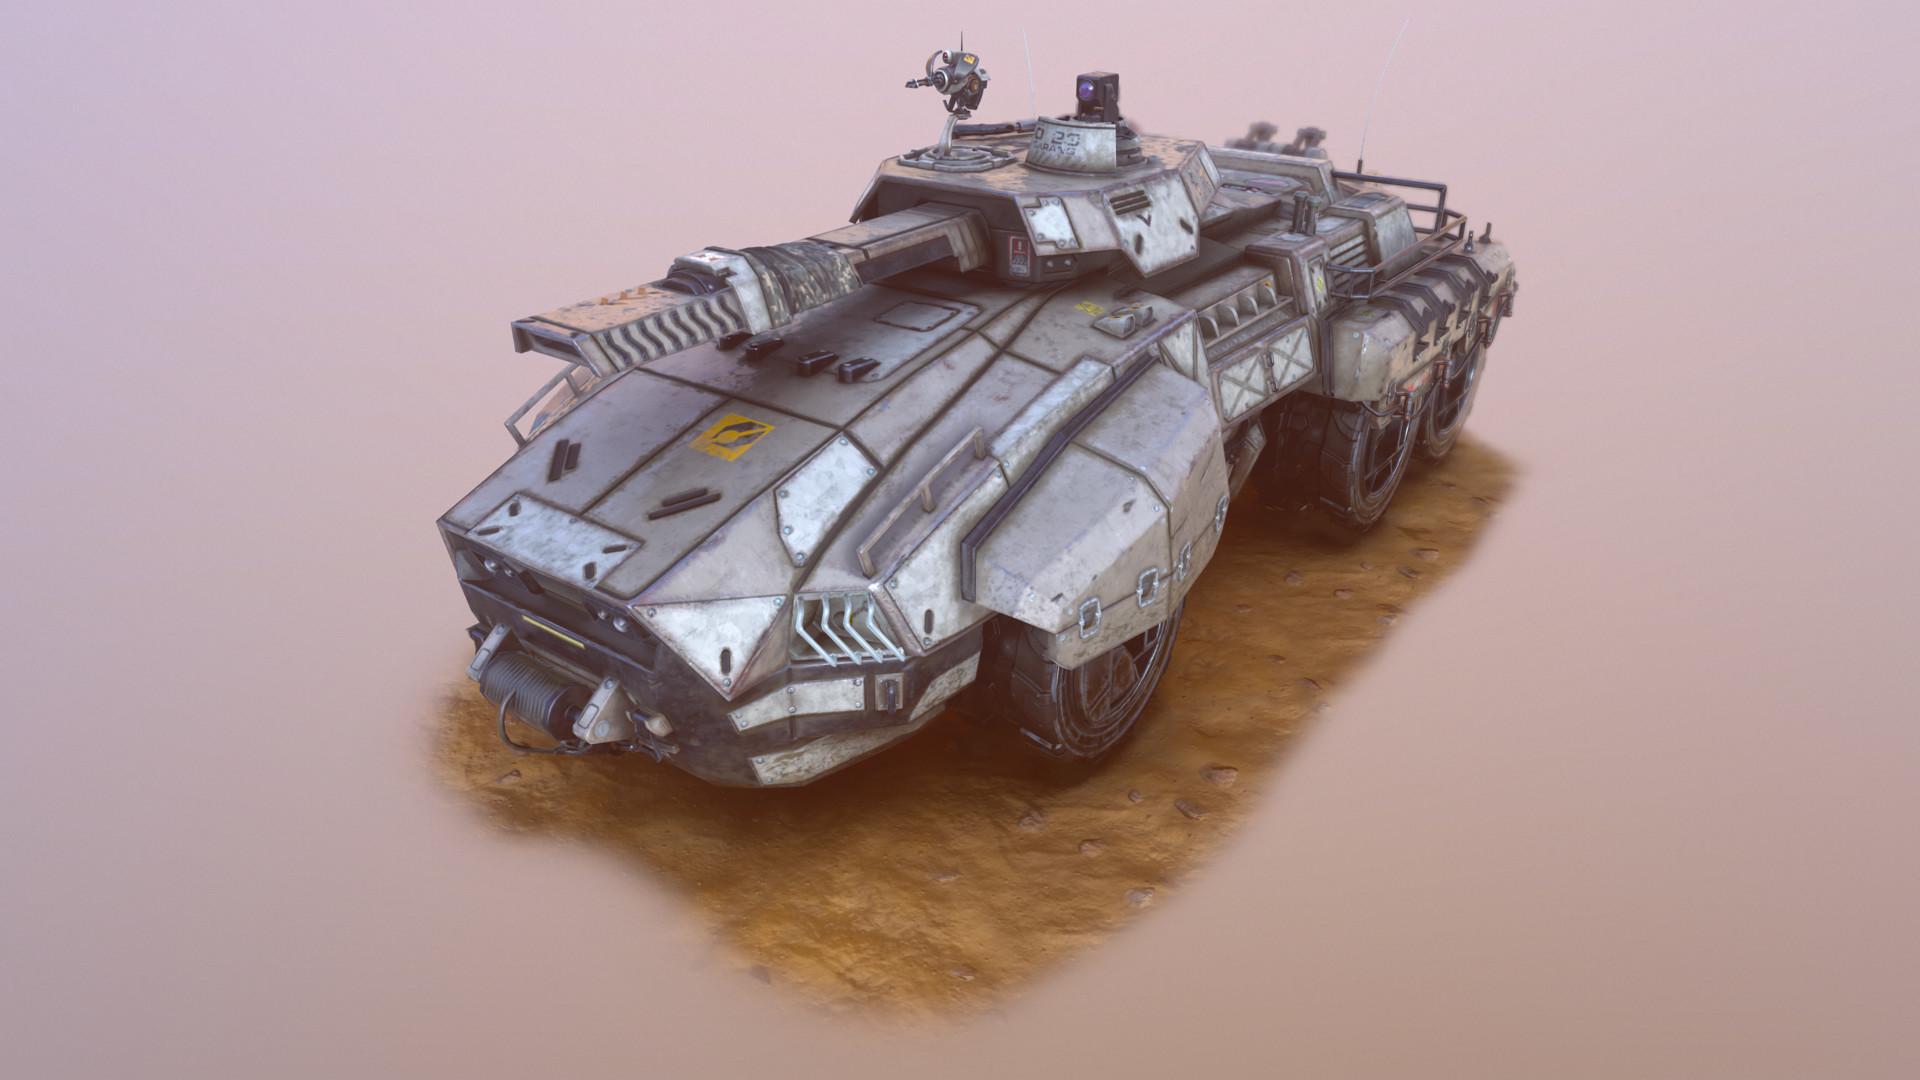 Sci-fi tank - 3DTotal Forums